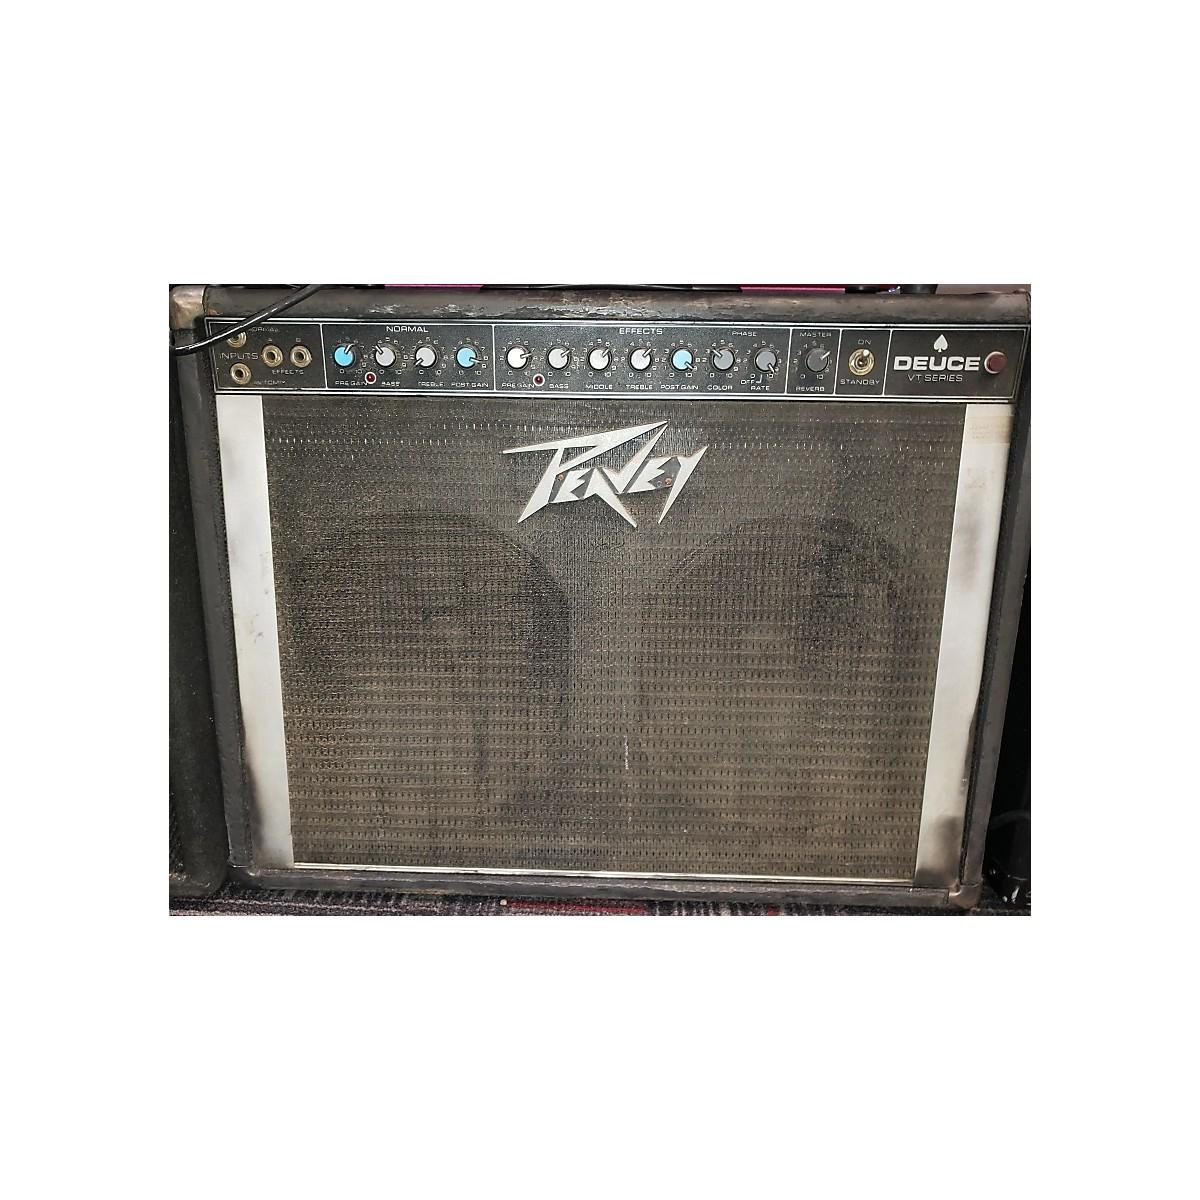 Peavey 1980s 1980'S Peavey Deuce Combo Amp Tube Guitar Combo Amp